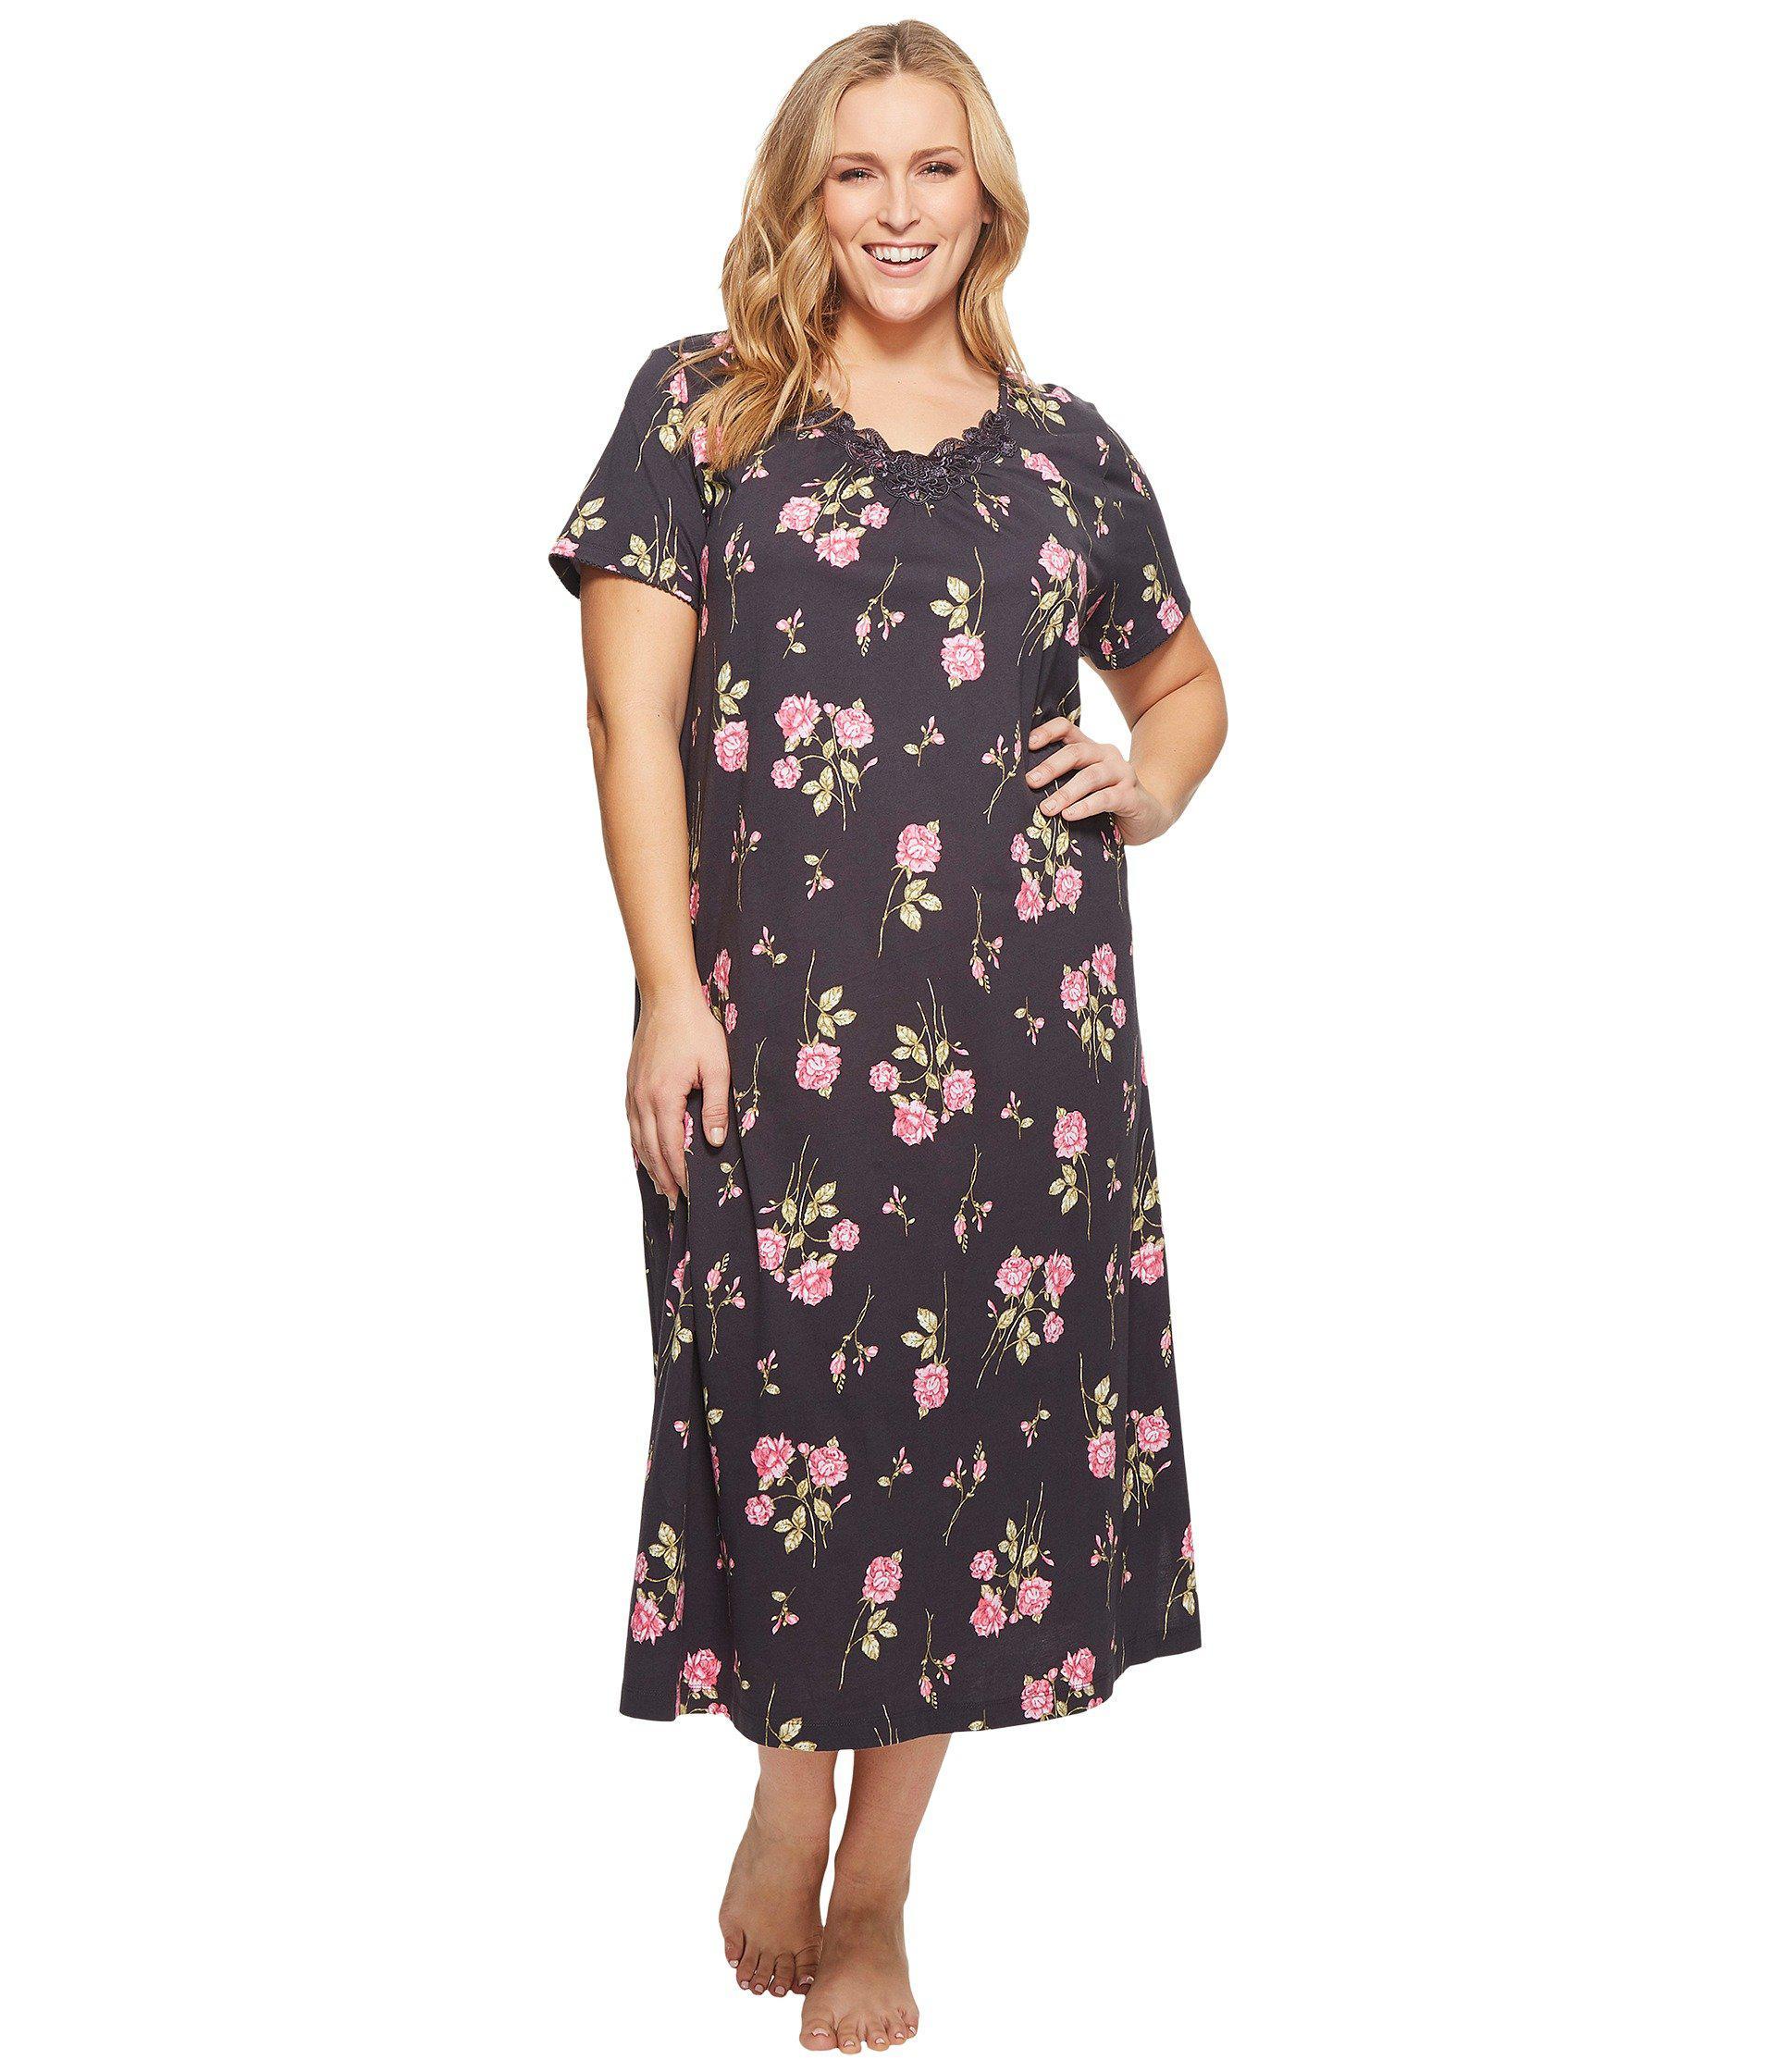 Lyst - Carole Hochman Plus Size Soft Jersey Short Sleeve Gown